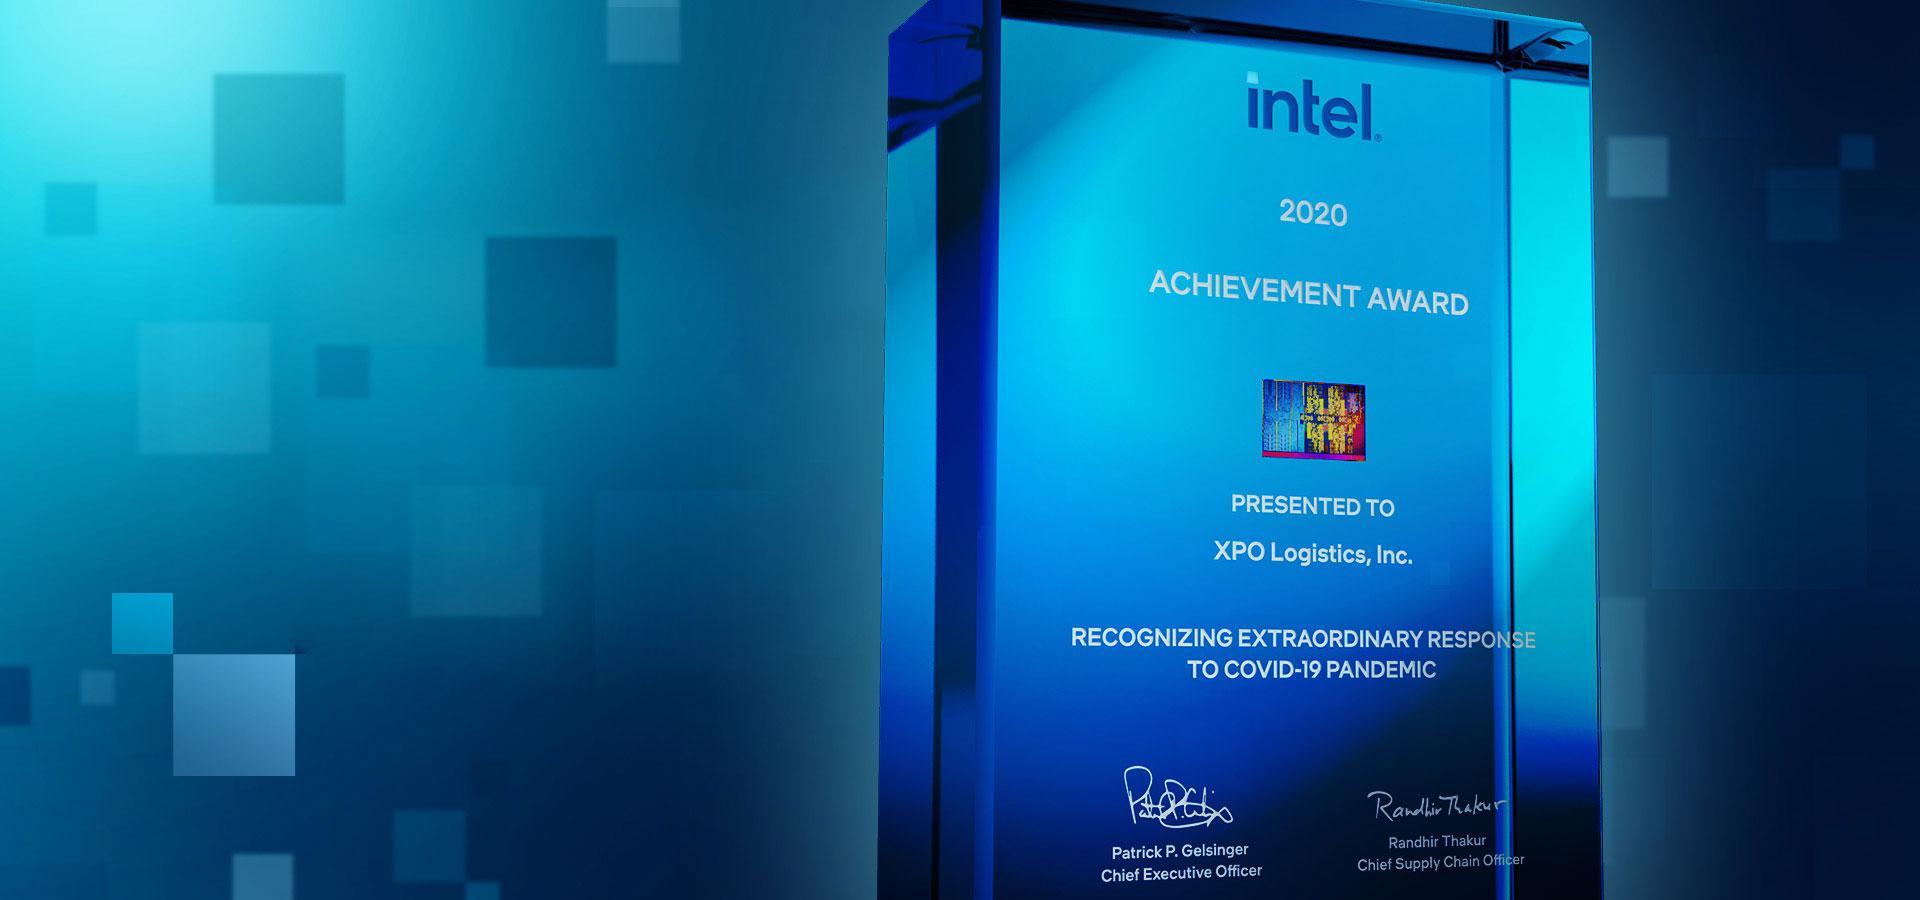 Image of Intel award trophy